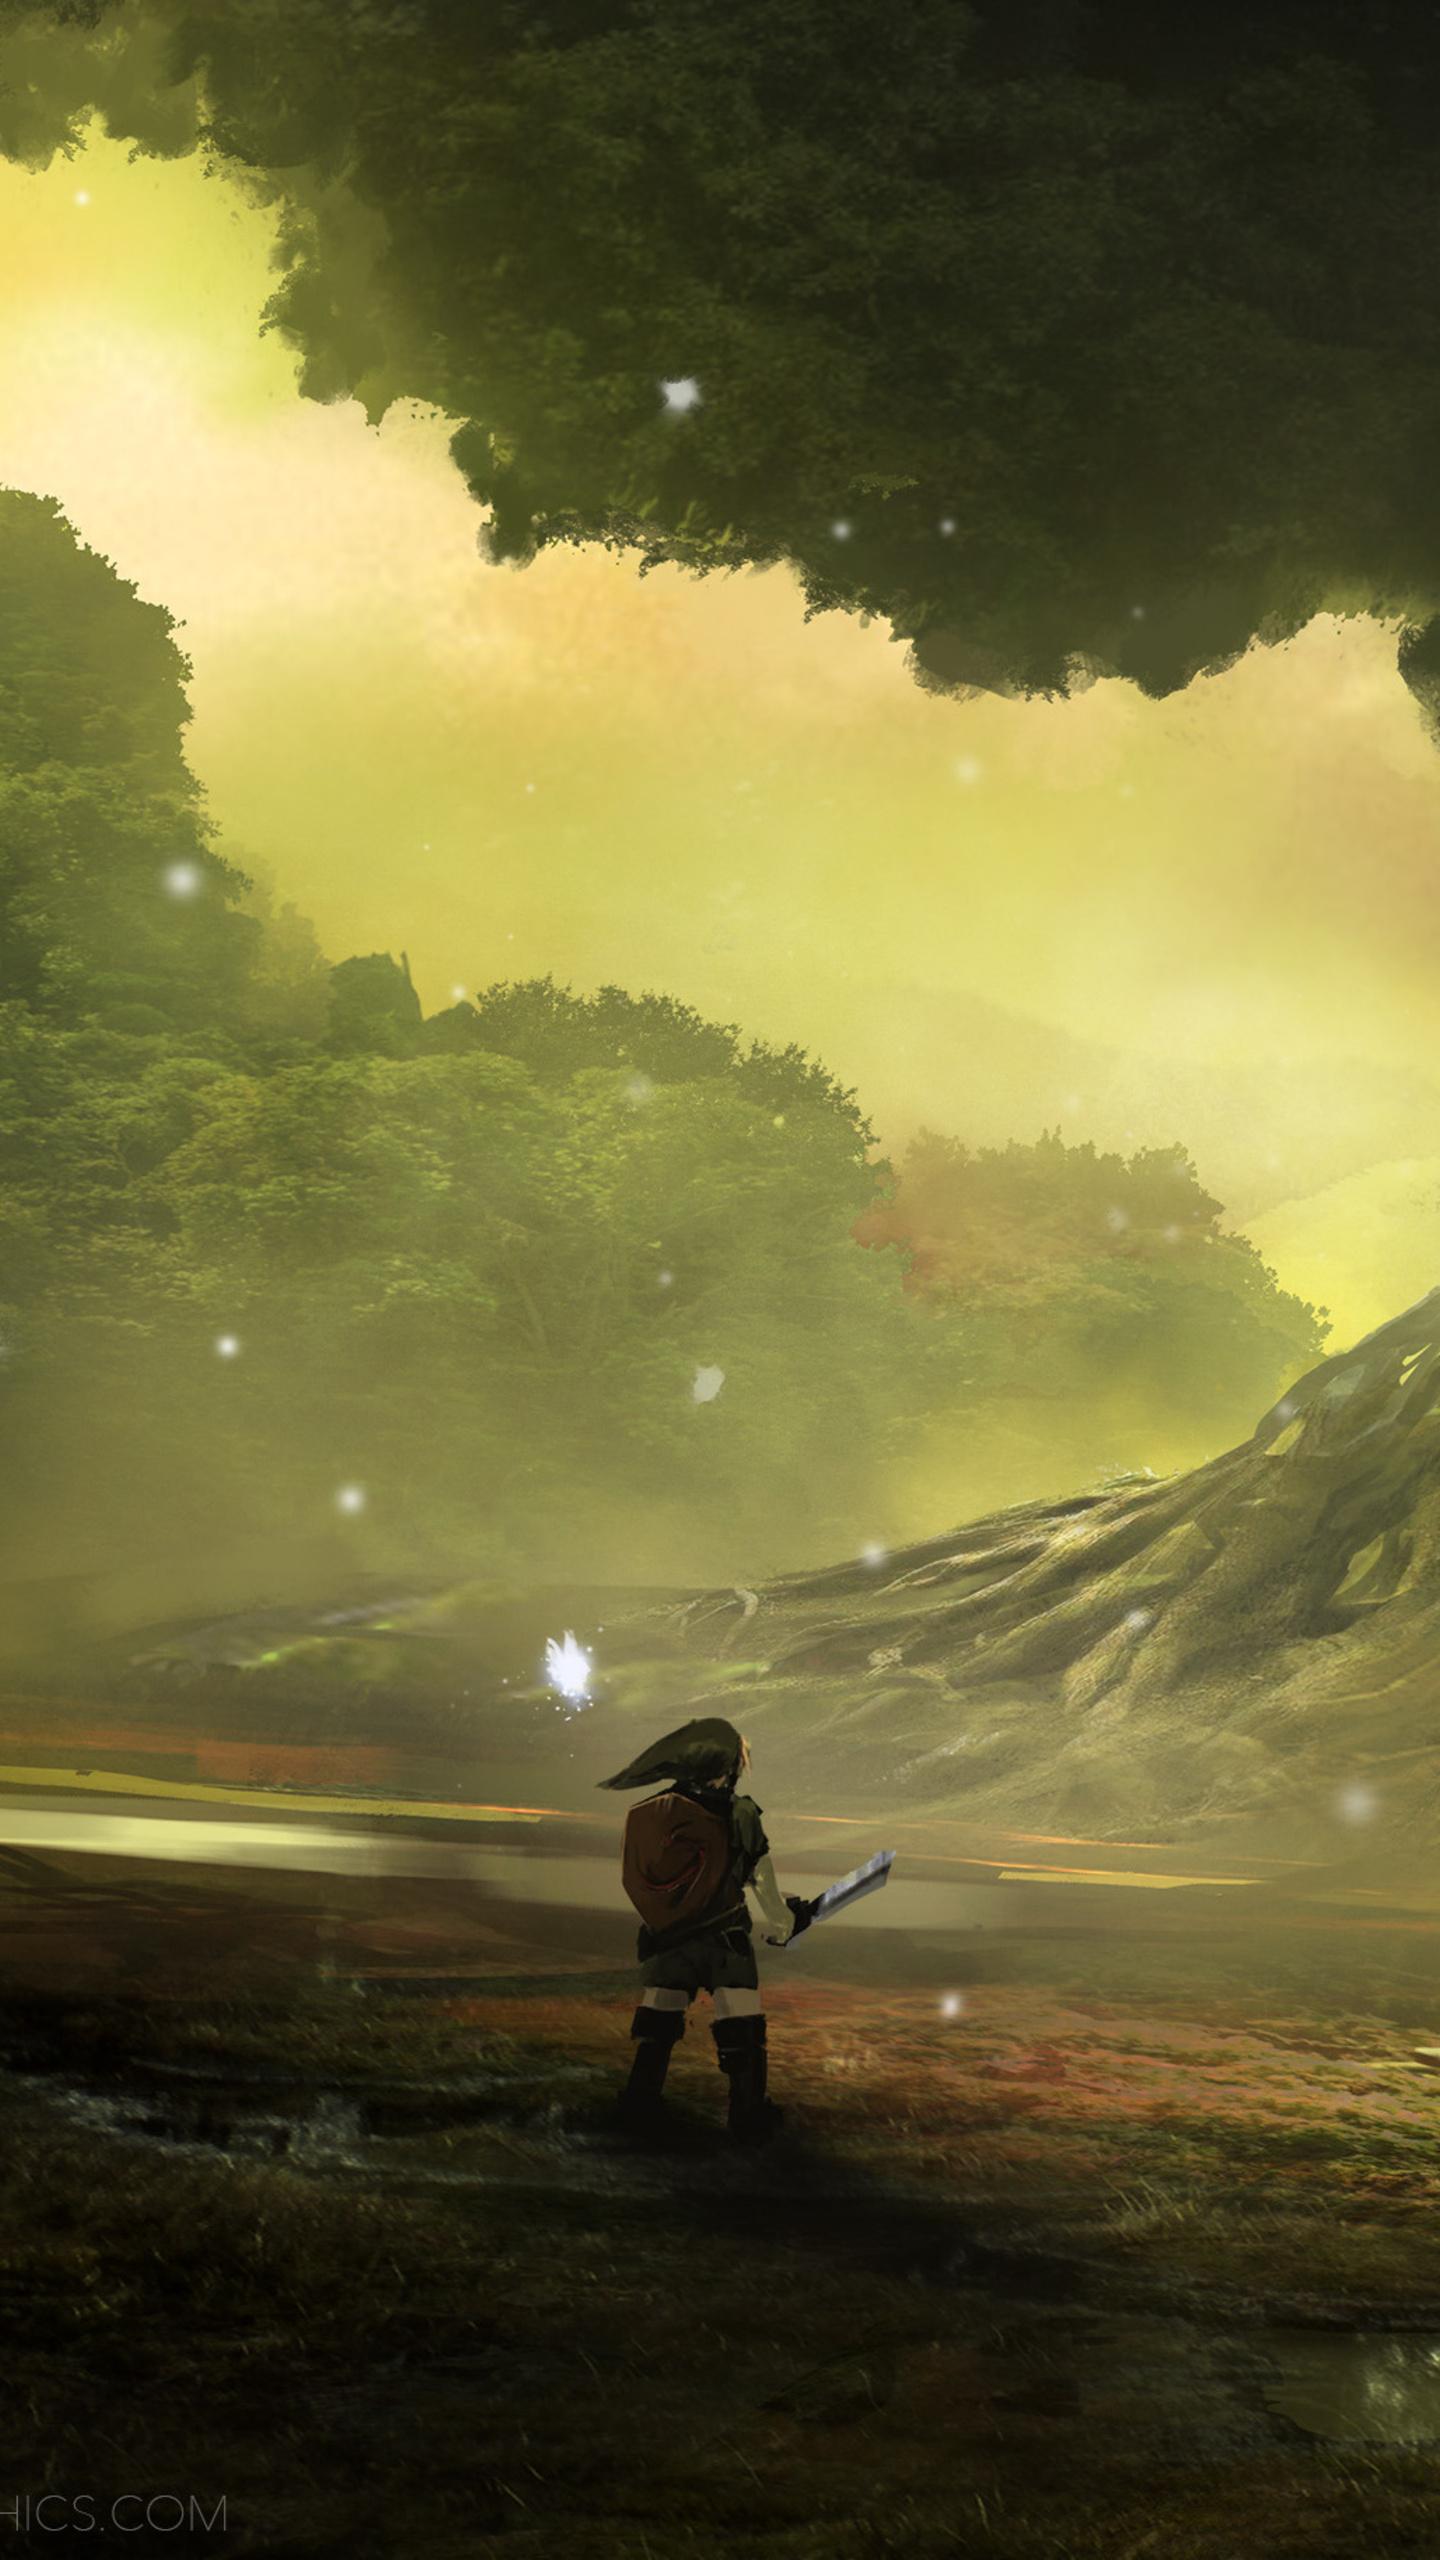 Zelda Ocarina Of Time 3d Wallpaper 1440x2560 Zelda Ocarina Of Time Artwork Samsung Galaxy S6